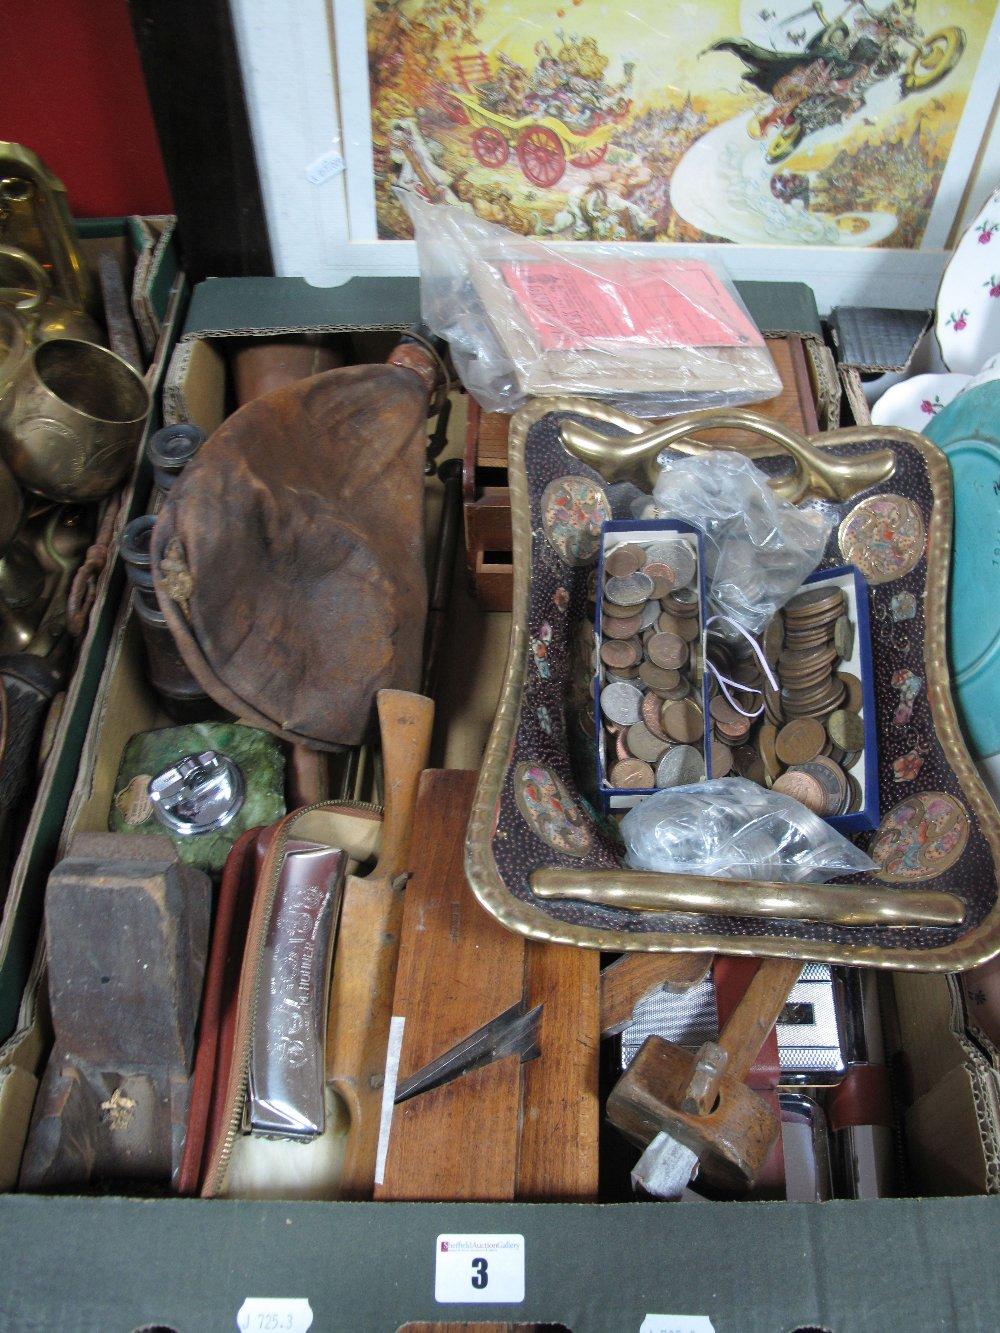 Lot 3 - A Leather Flask, pre decimal G.B coinage, moulding plane, marker, spoke shave, Hohner harmonica,